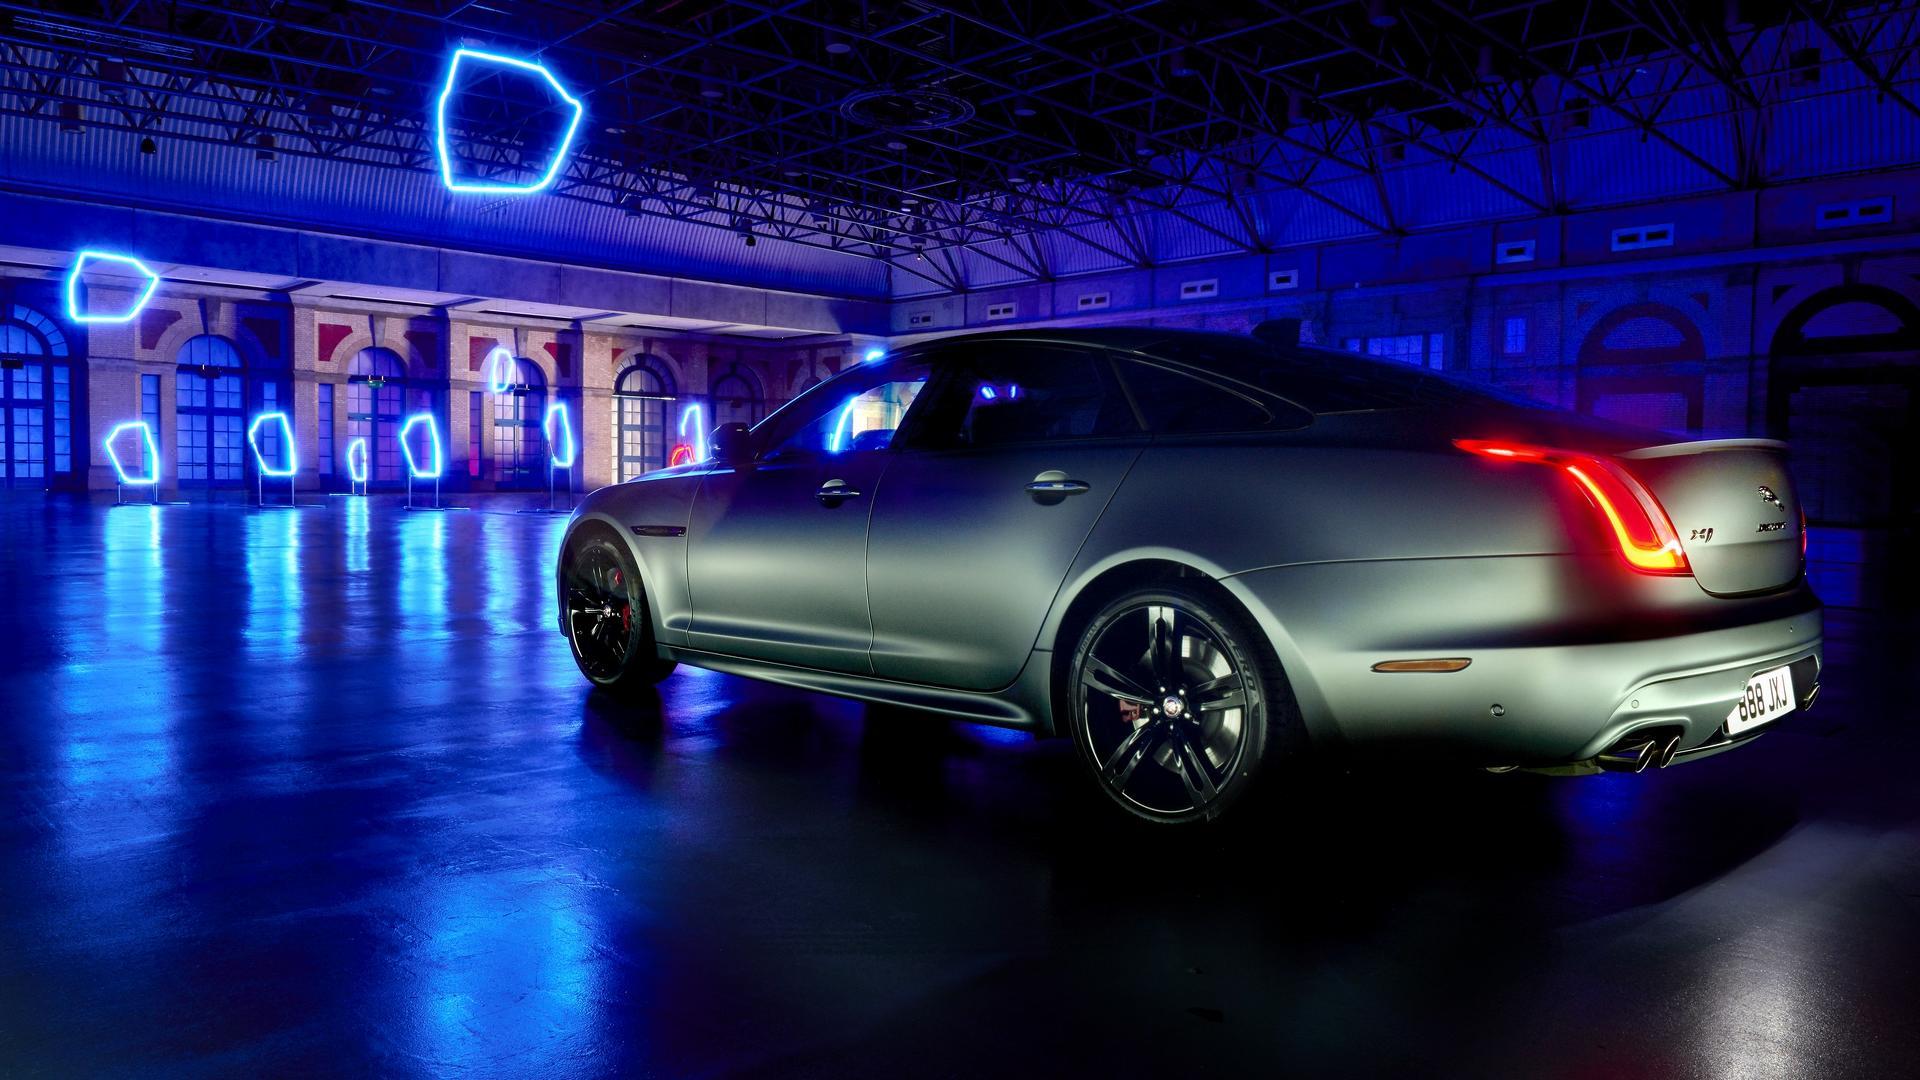 Jaguar Promises Next Gen Xj Will Be Bigger And Sportier